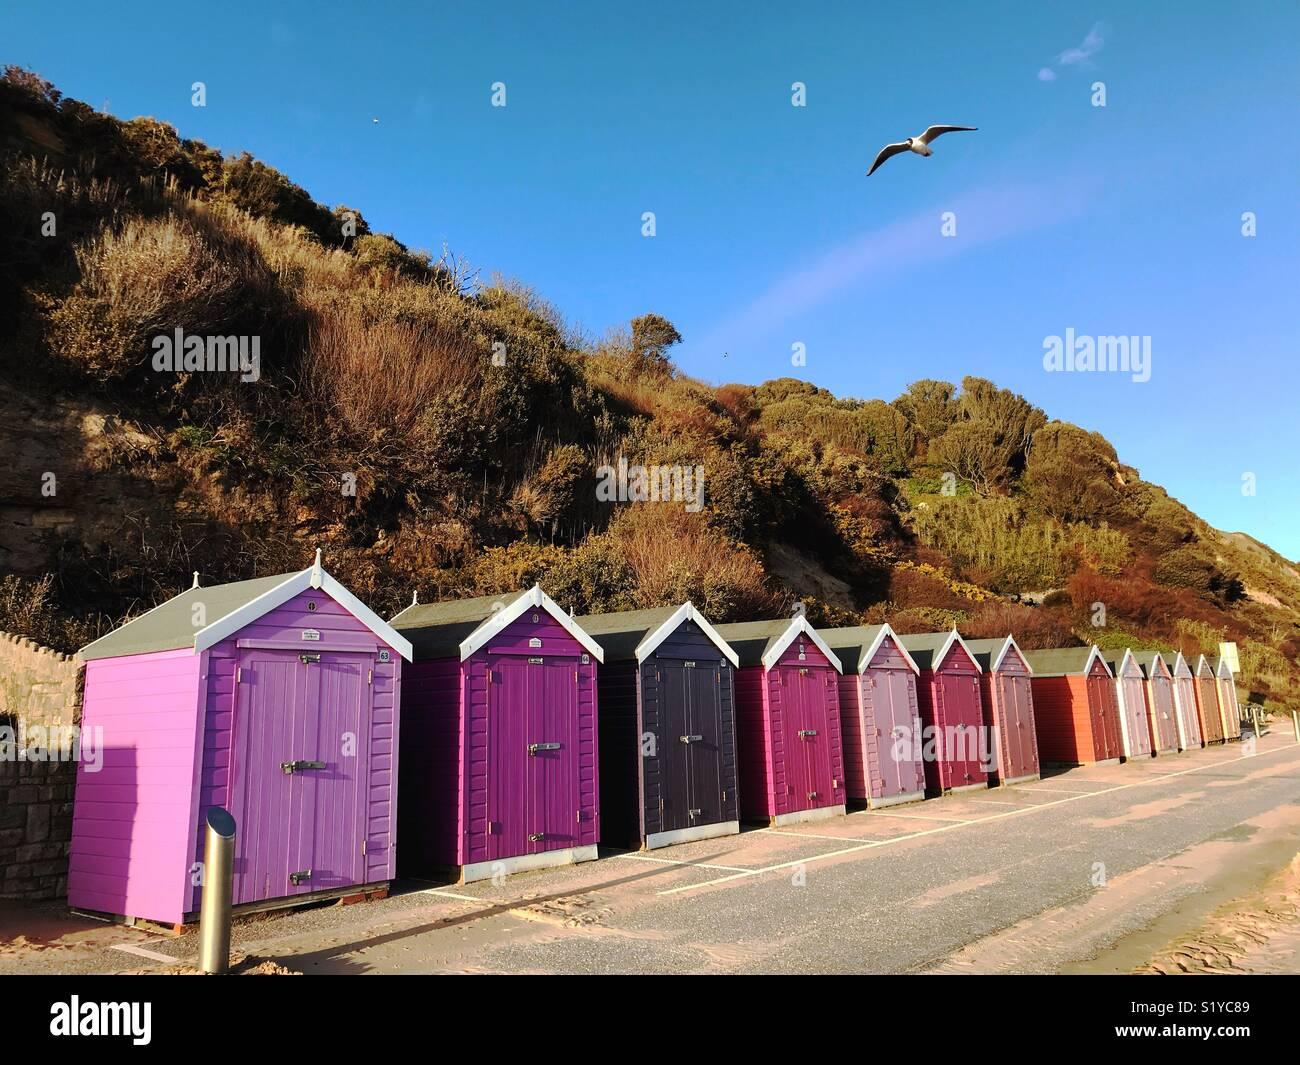 Coloridas casetas de playa en Bournemouth Imagen De Stock